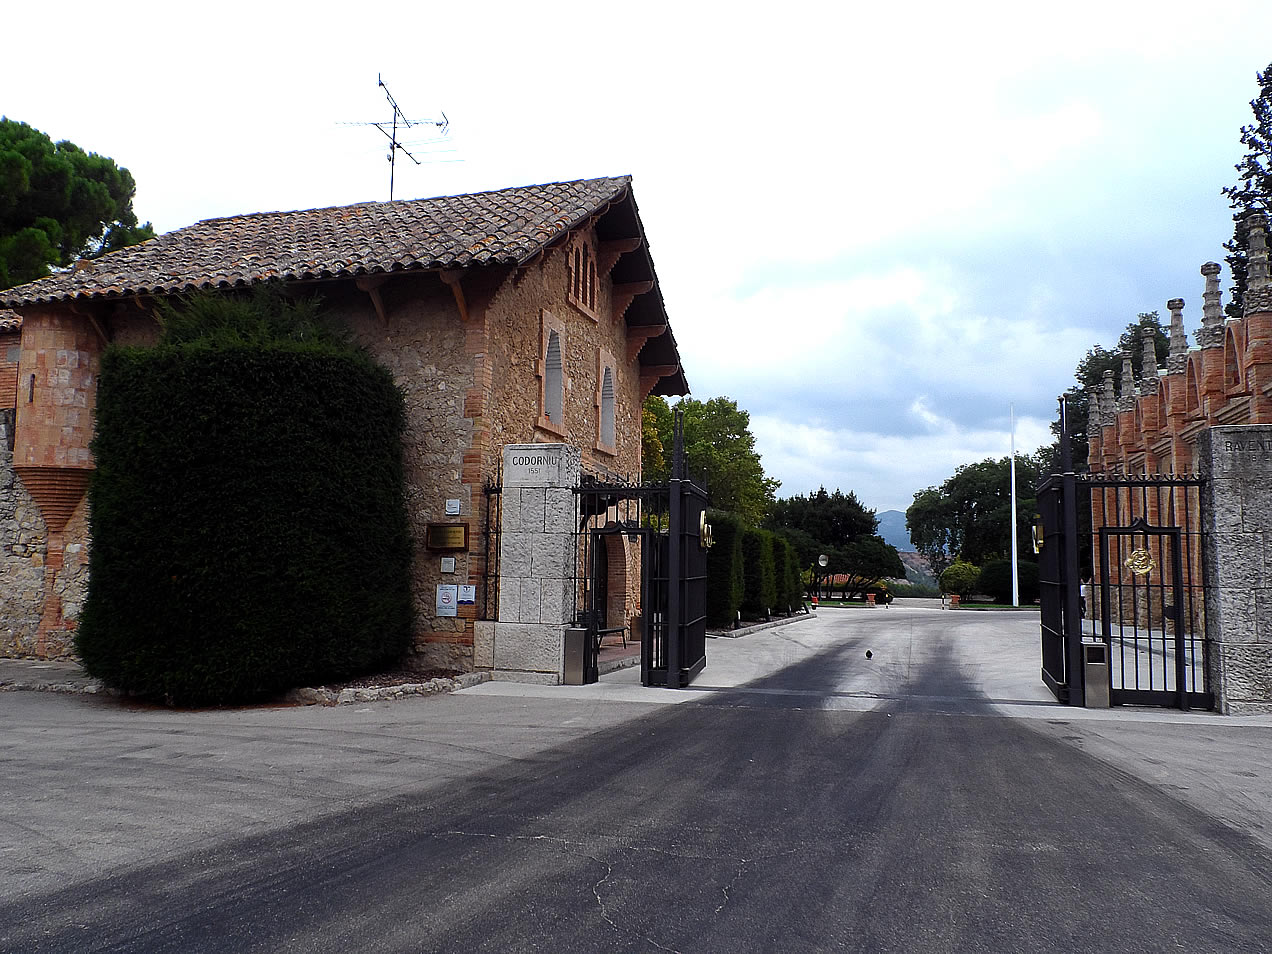 Codorniu 1551 vineyard in Spain